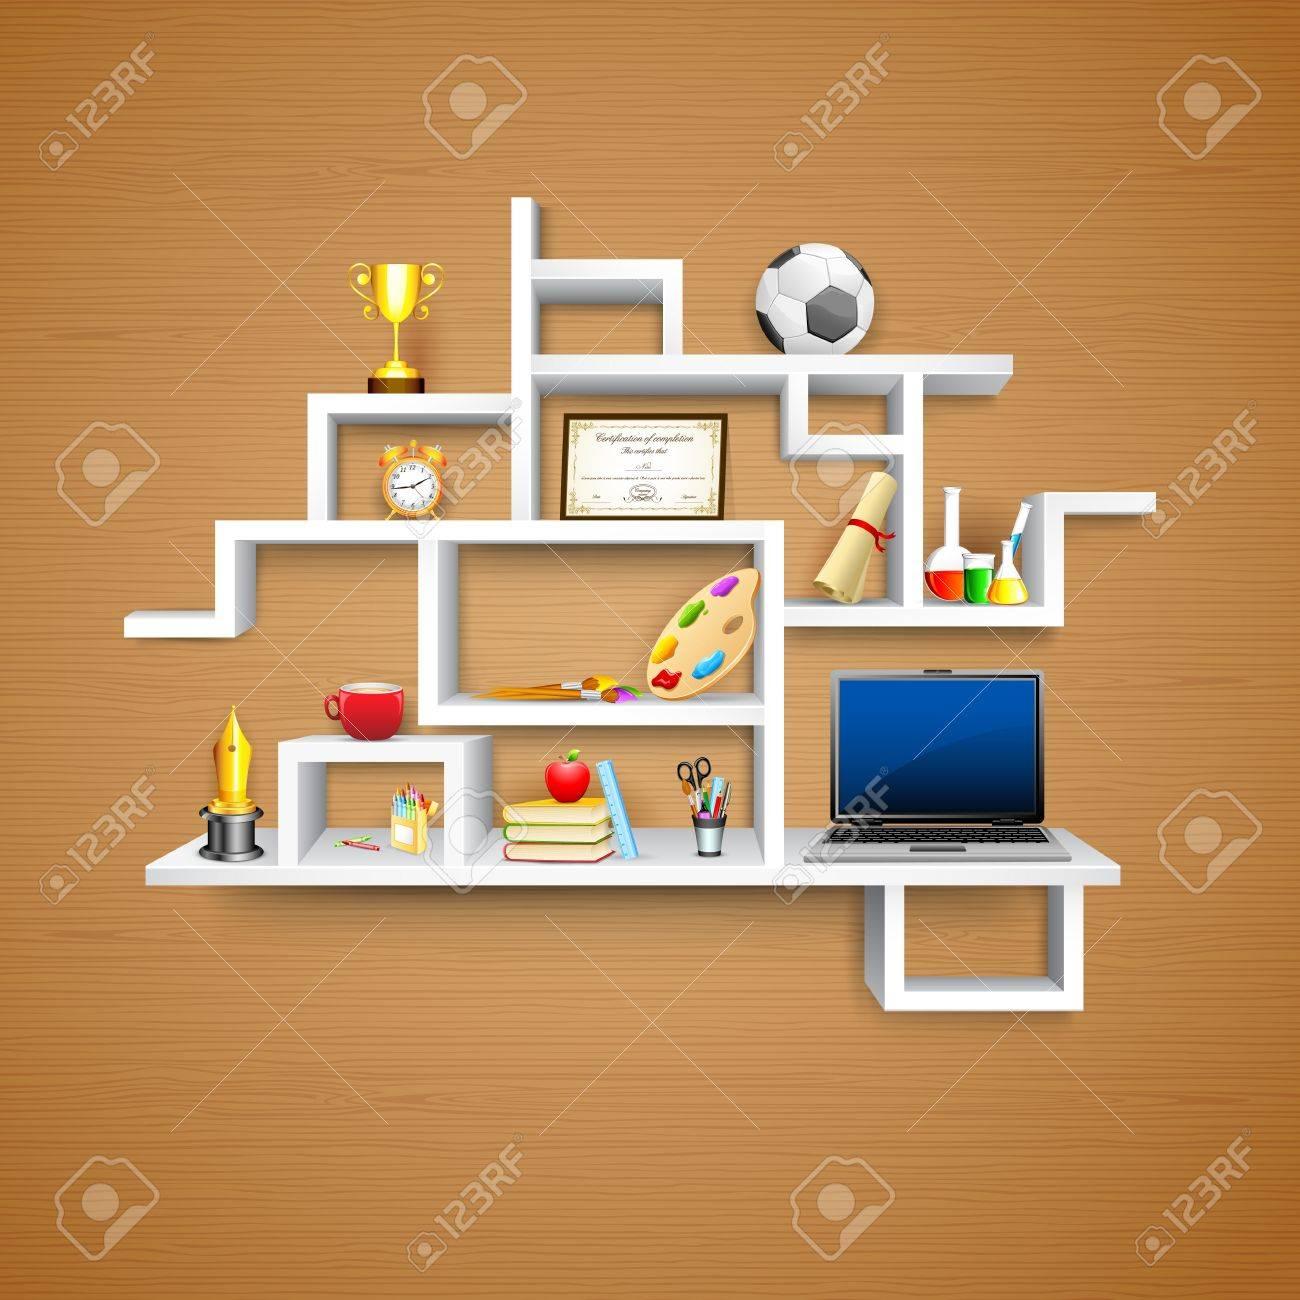 illustration of education object on display shelf Stock Vector - 15196003